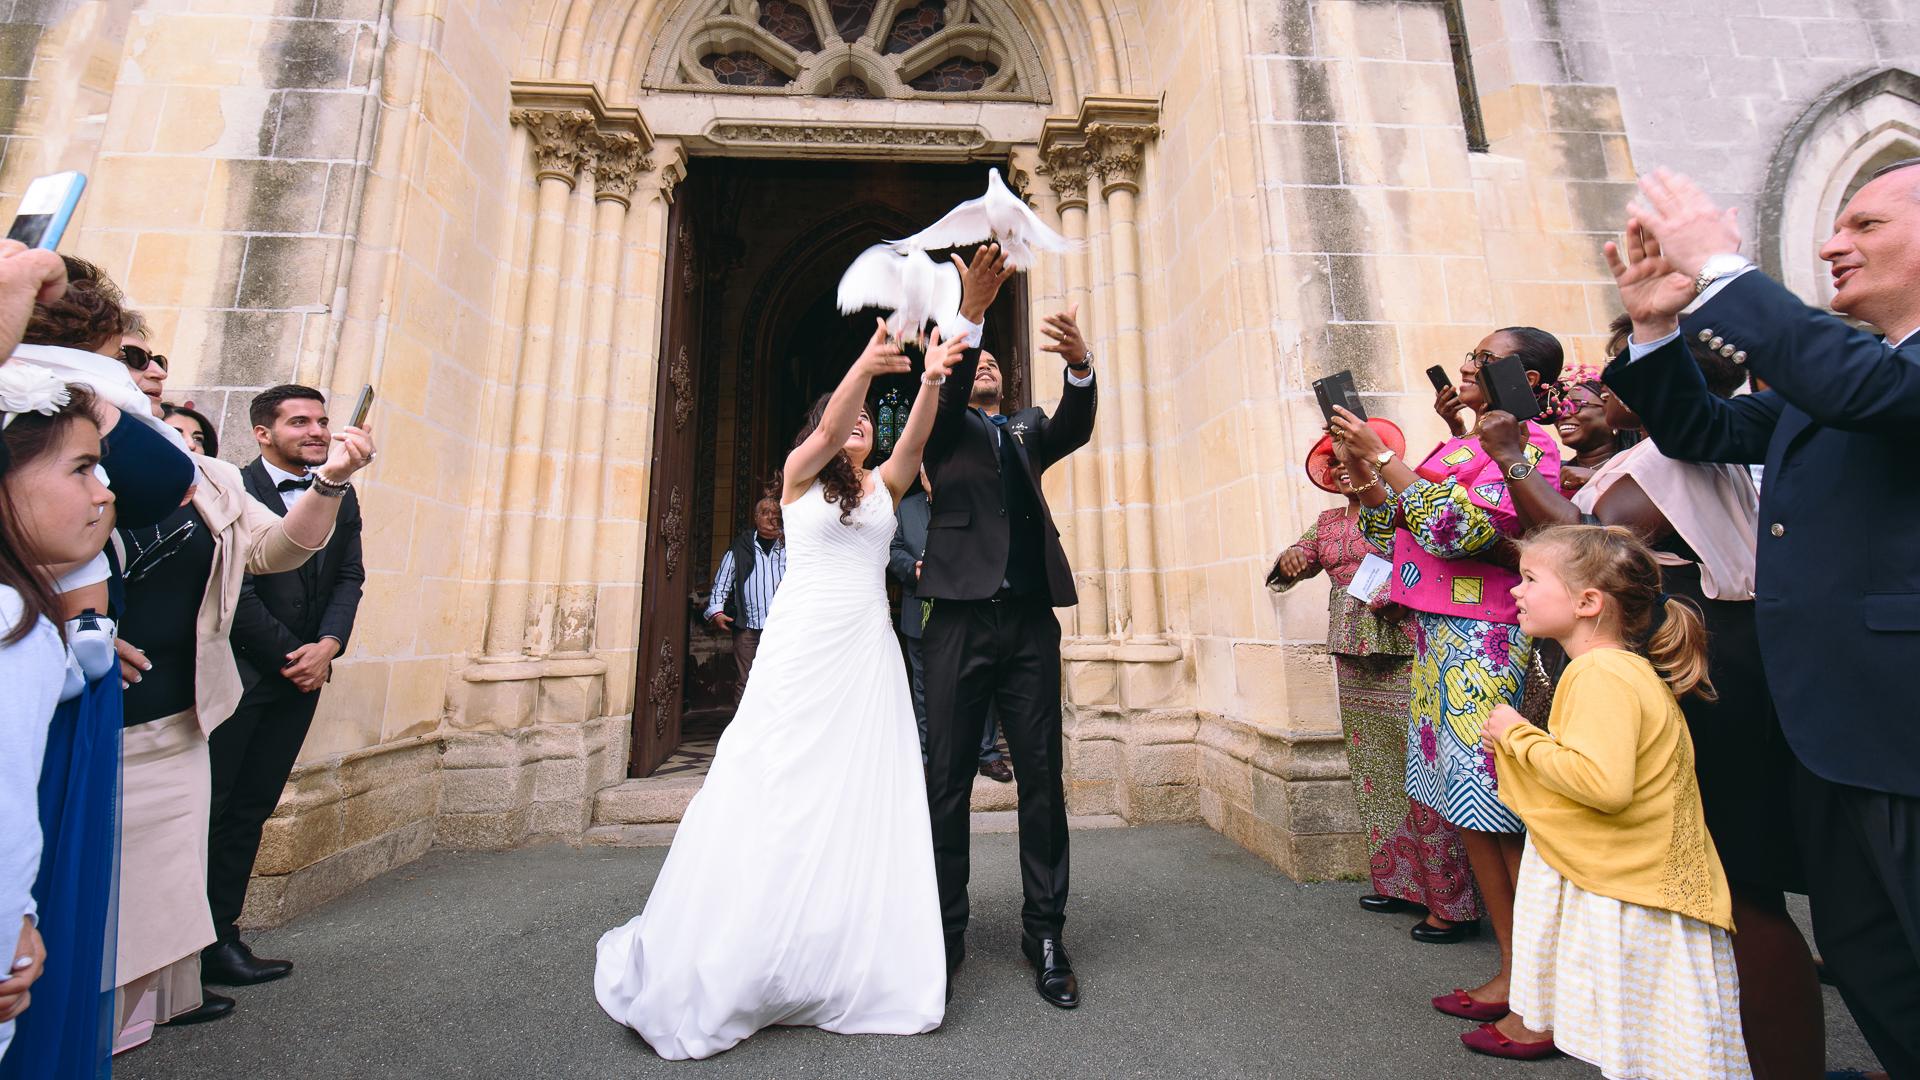 Photographe de mariage Angers 49